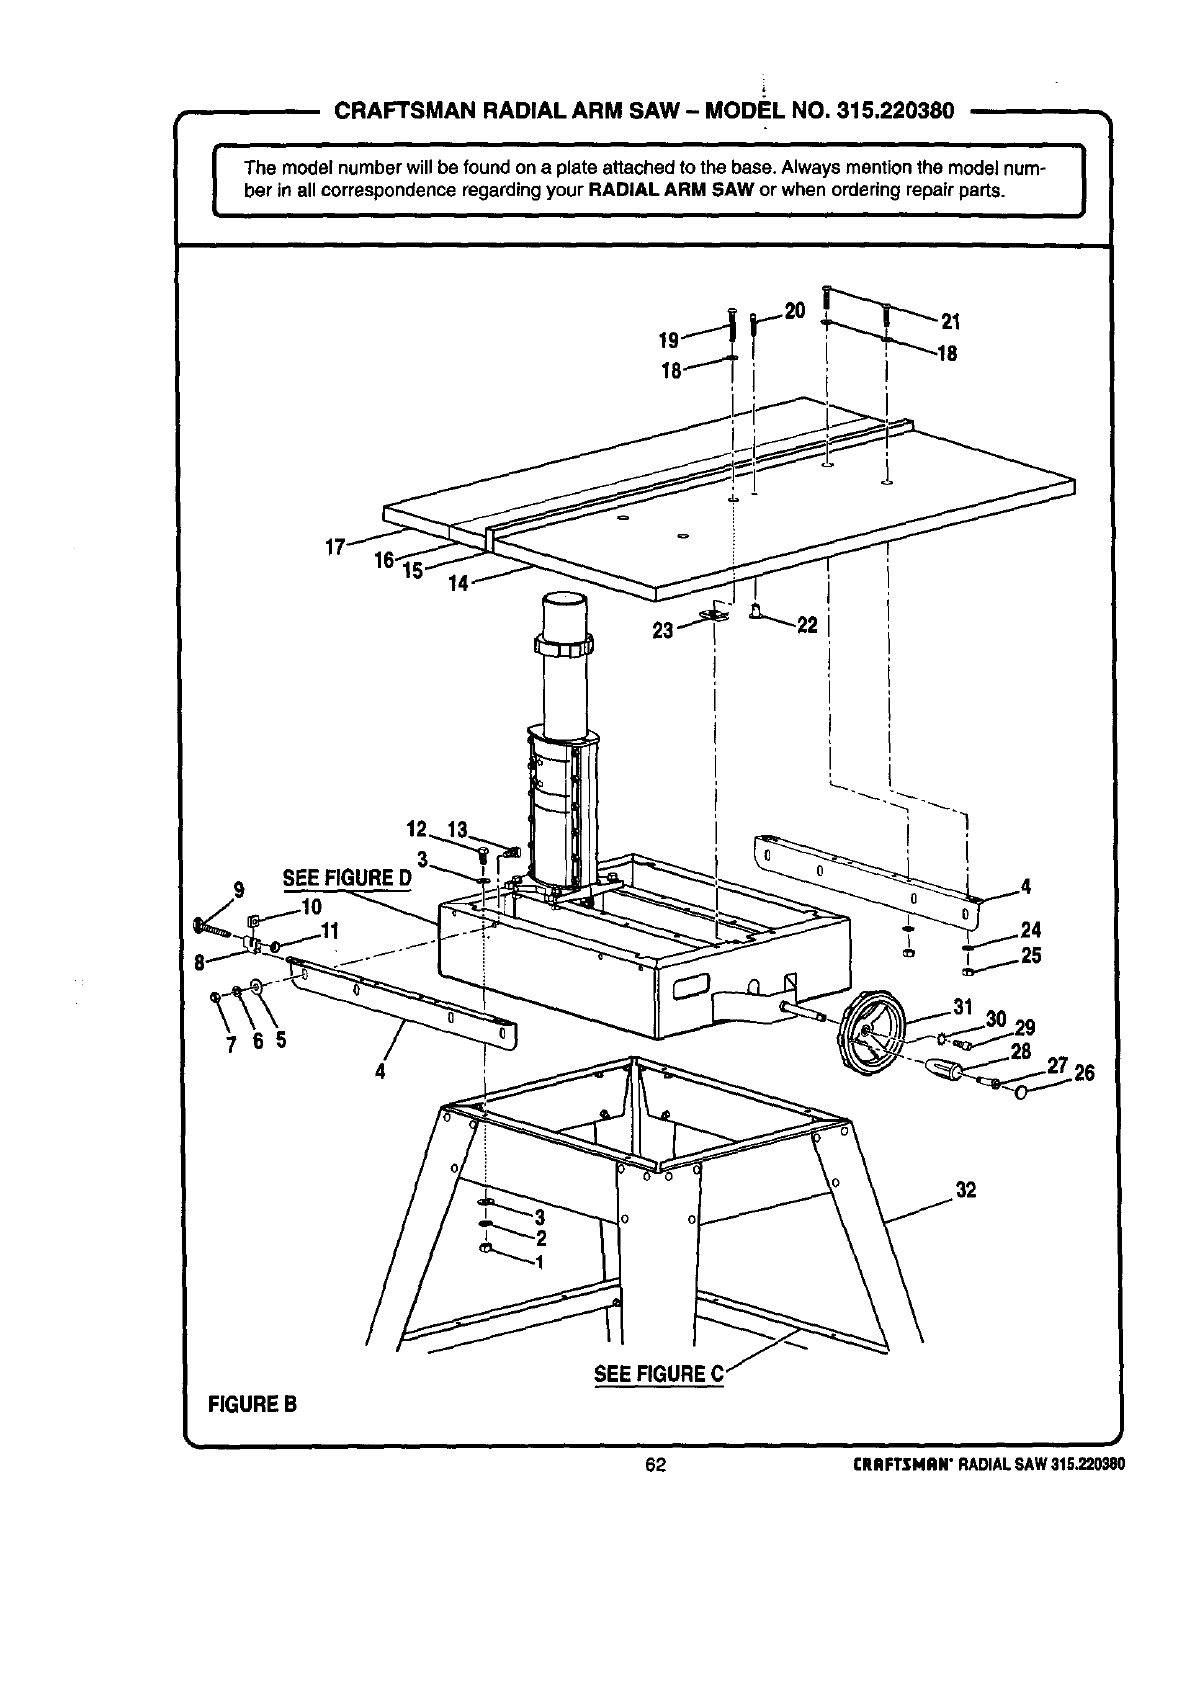 Craftsman 315220380 User Manual 10 IN. STATIONARY RADIAL